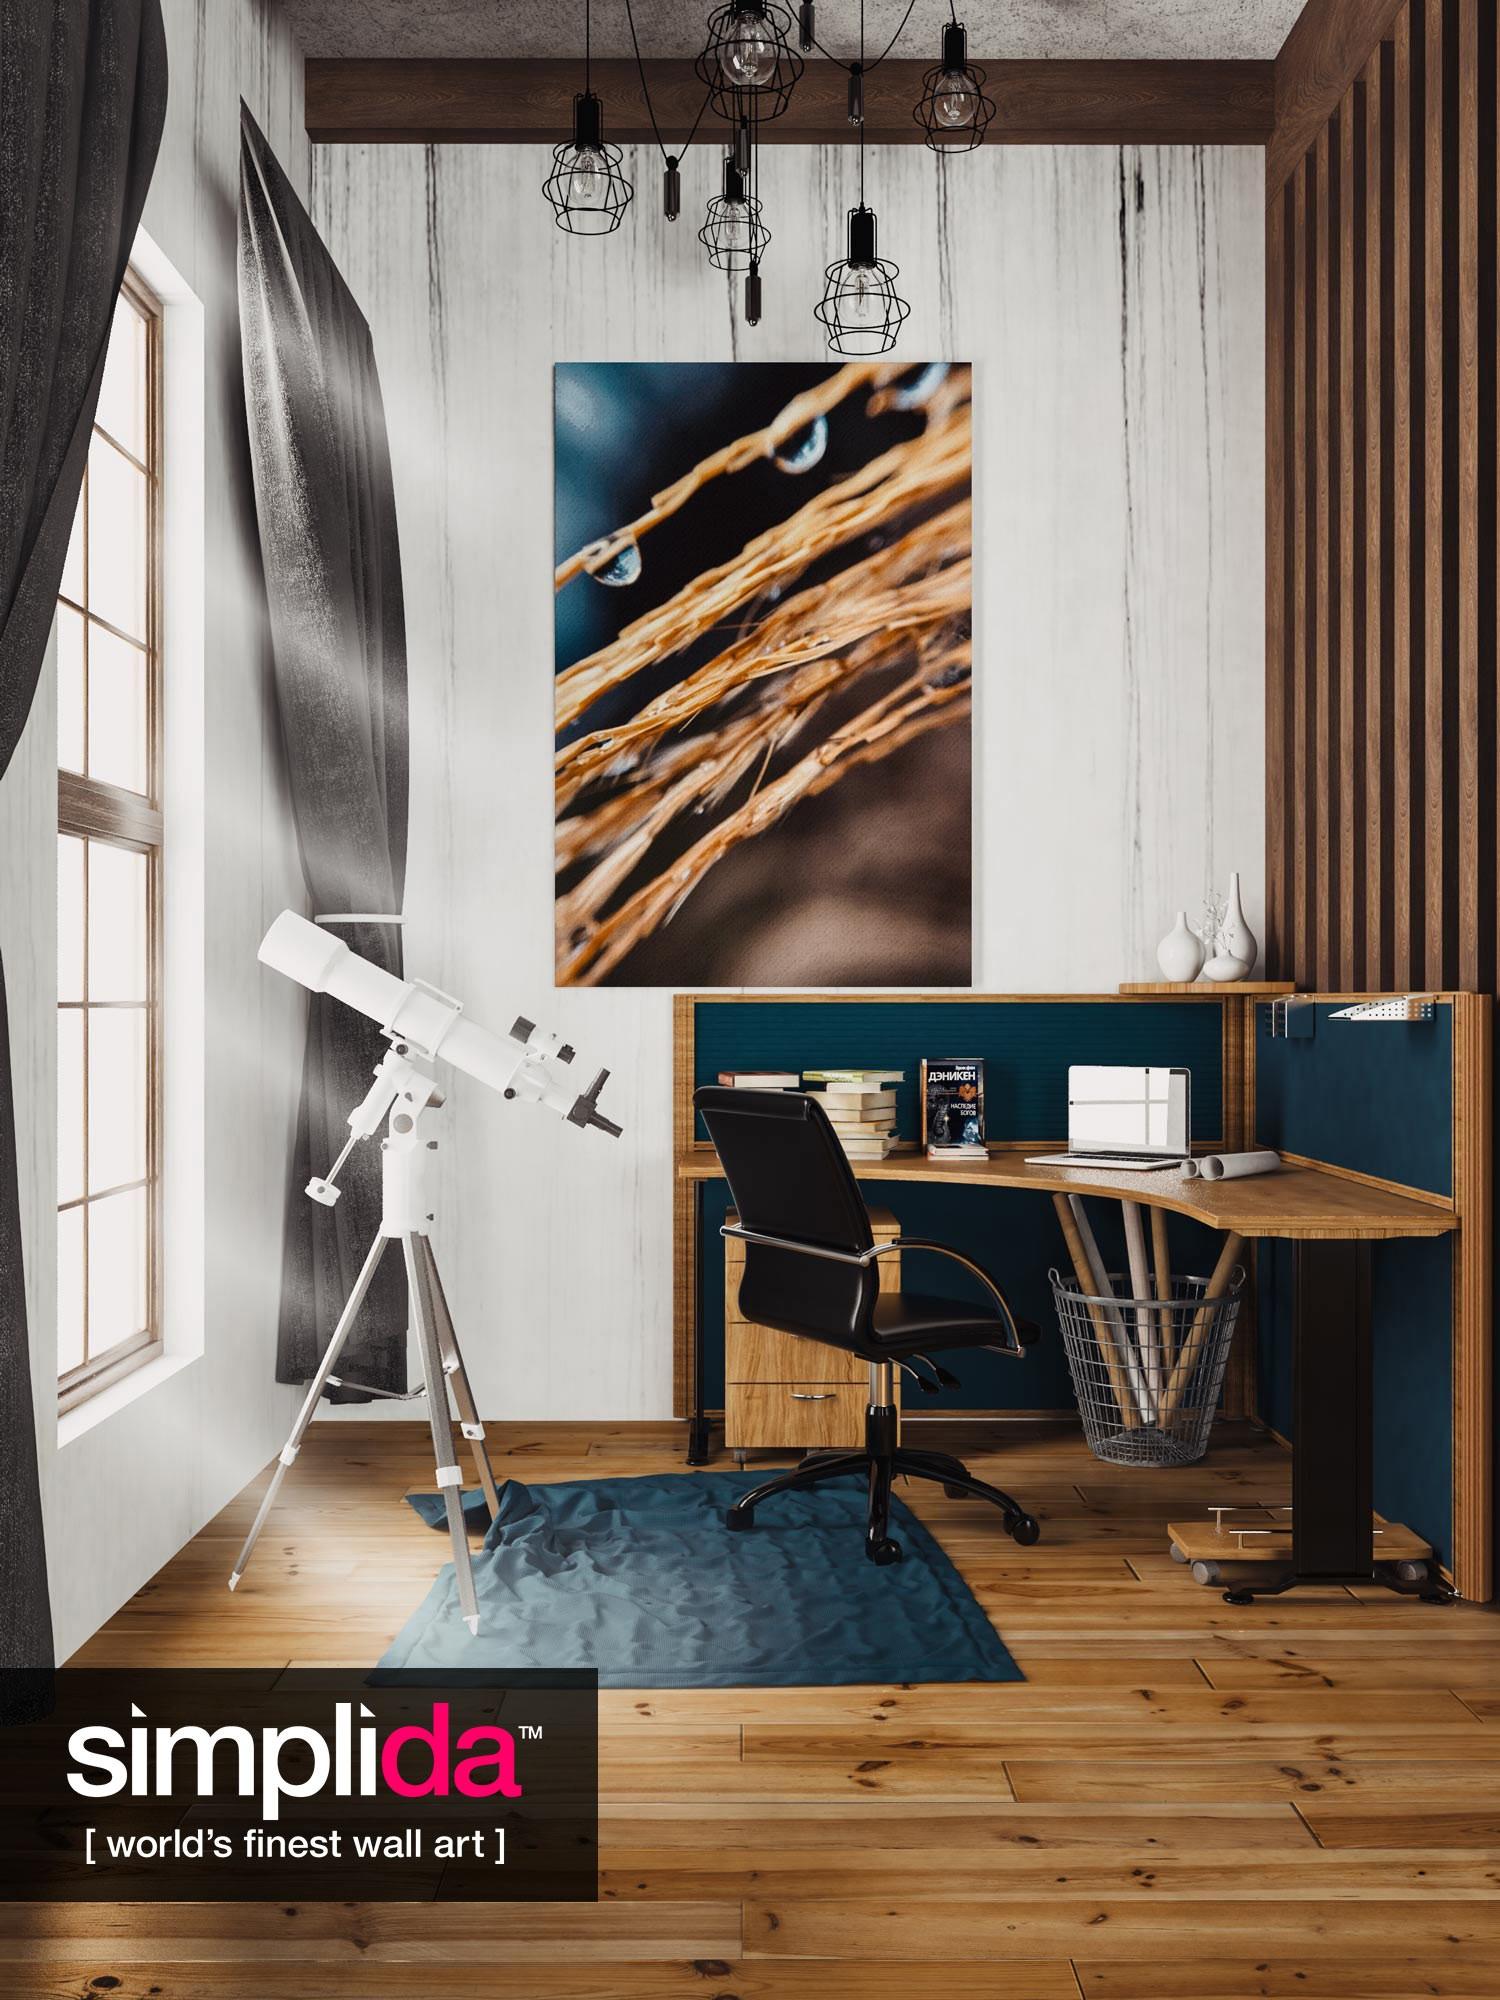 Fine Art Nature Photo Prints on Canvas – Simplida Wall Art